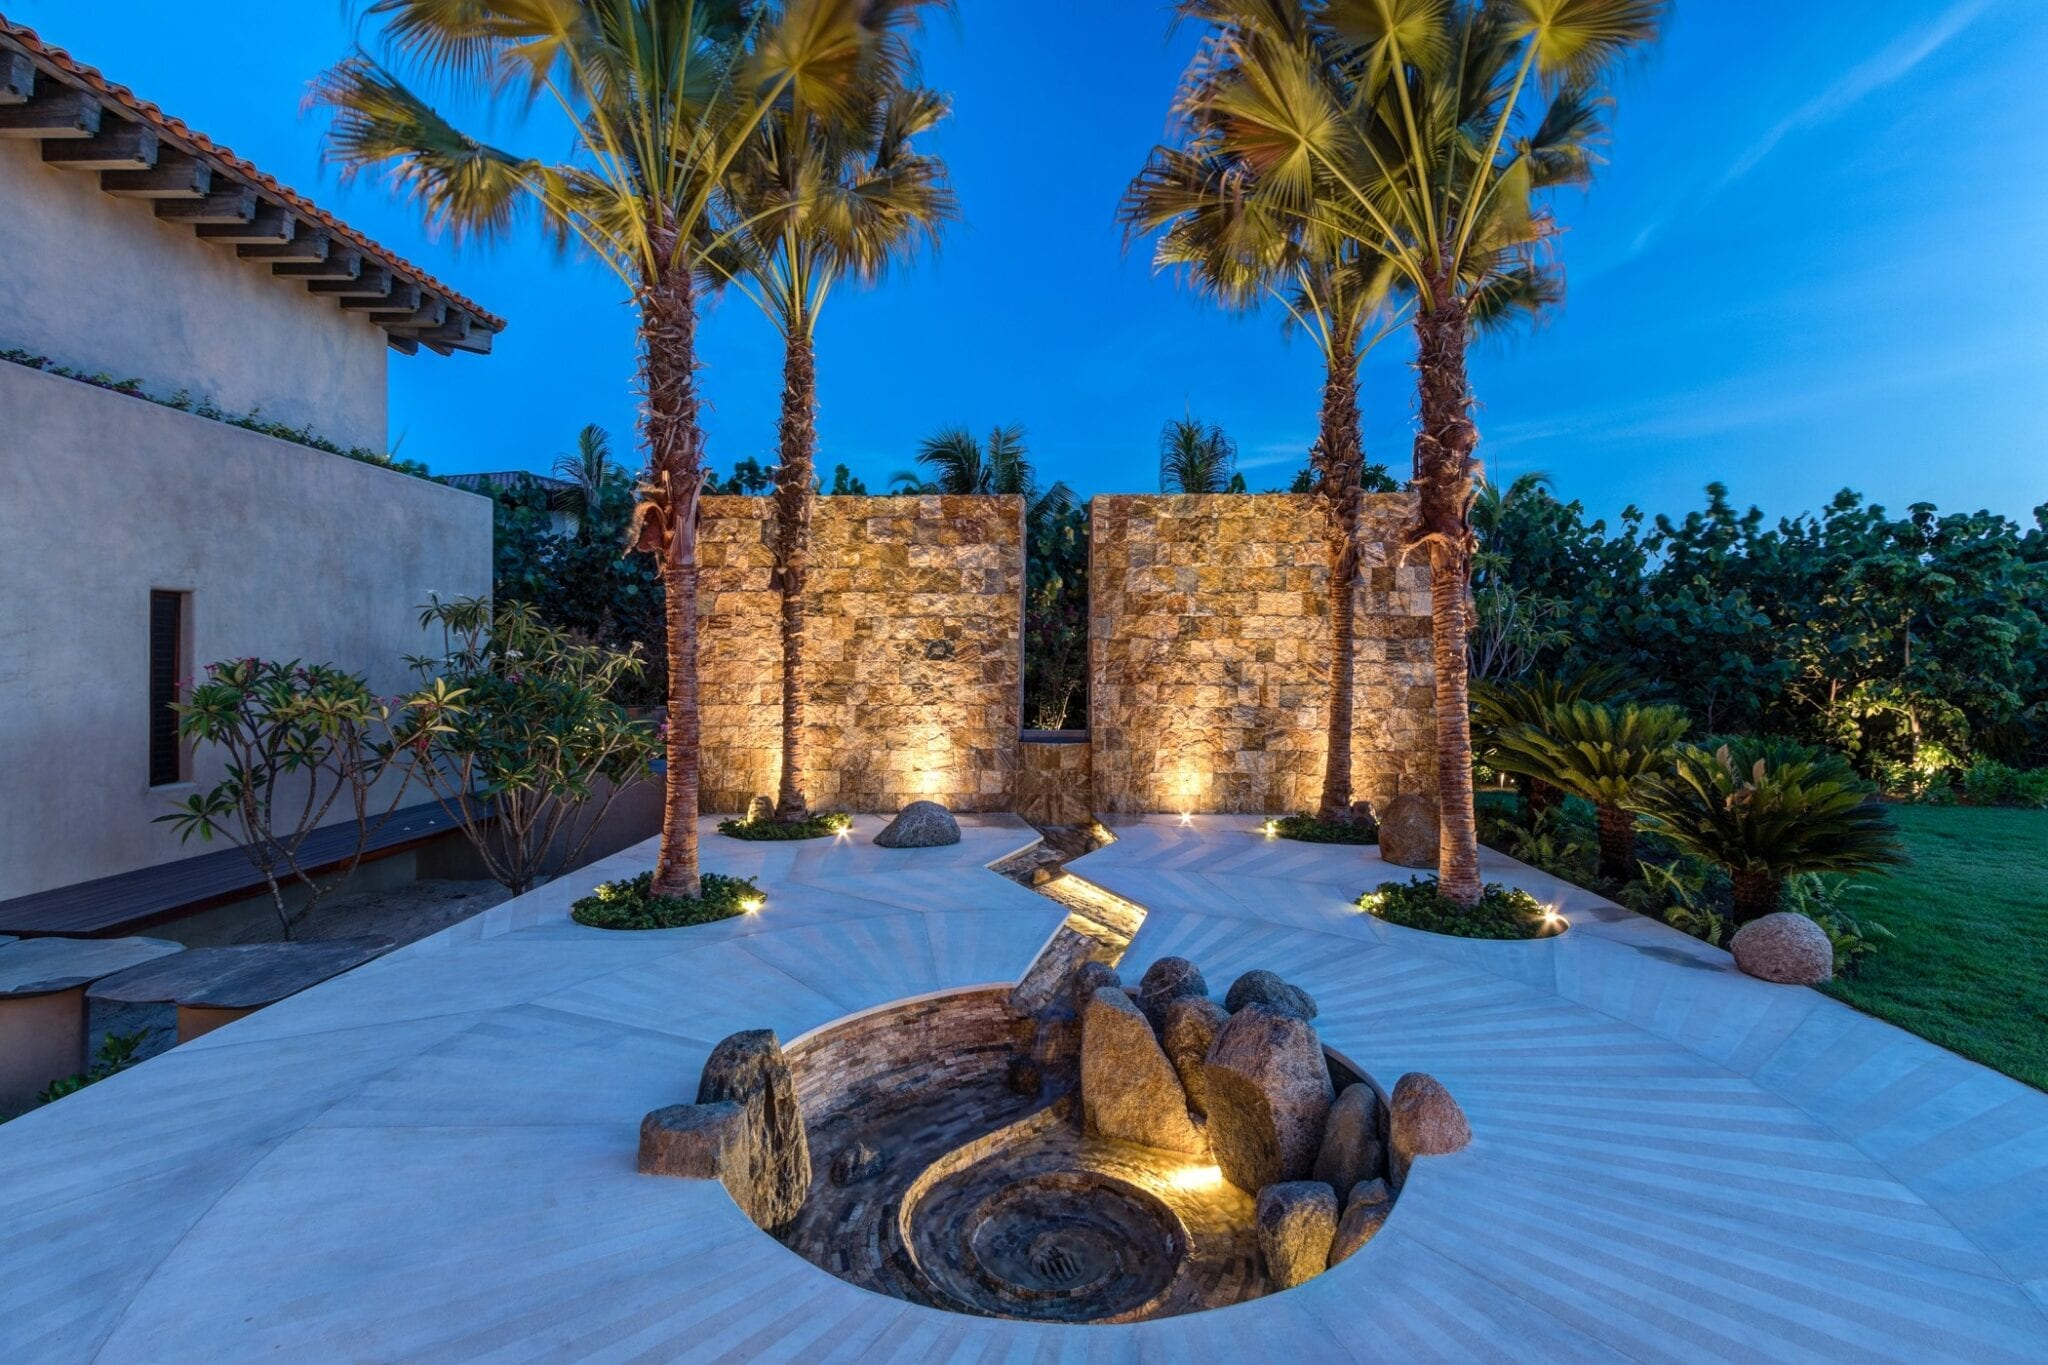 Casa Koko Entrain Fountain Dusk